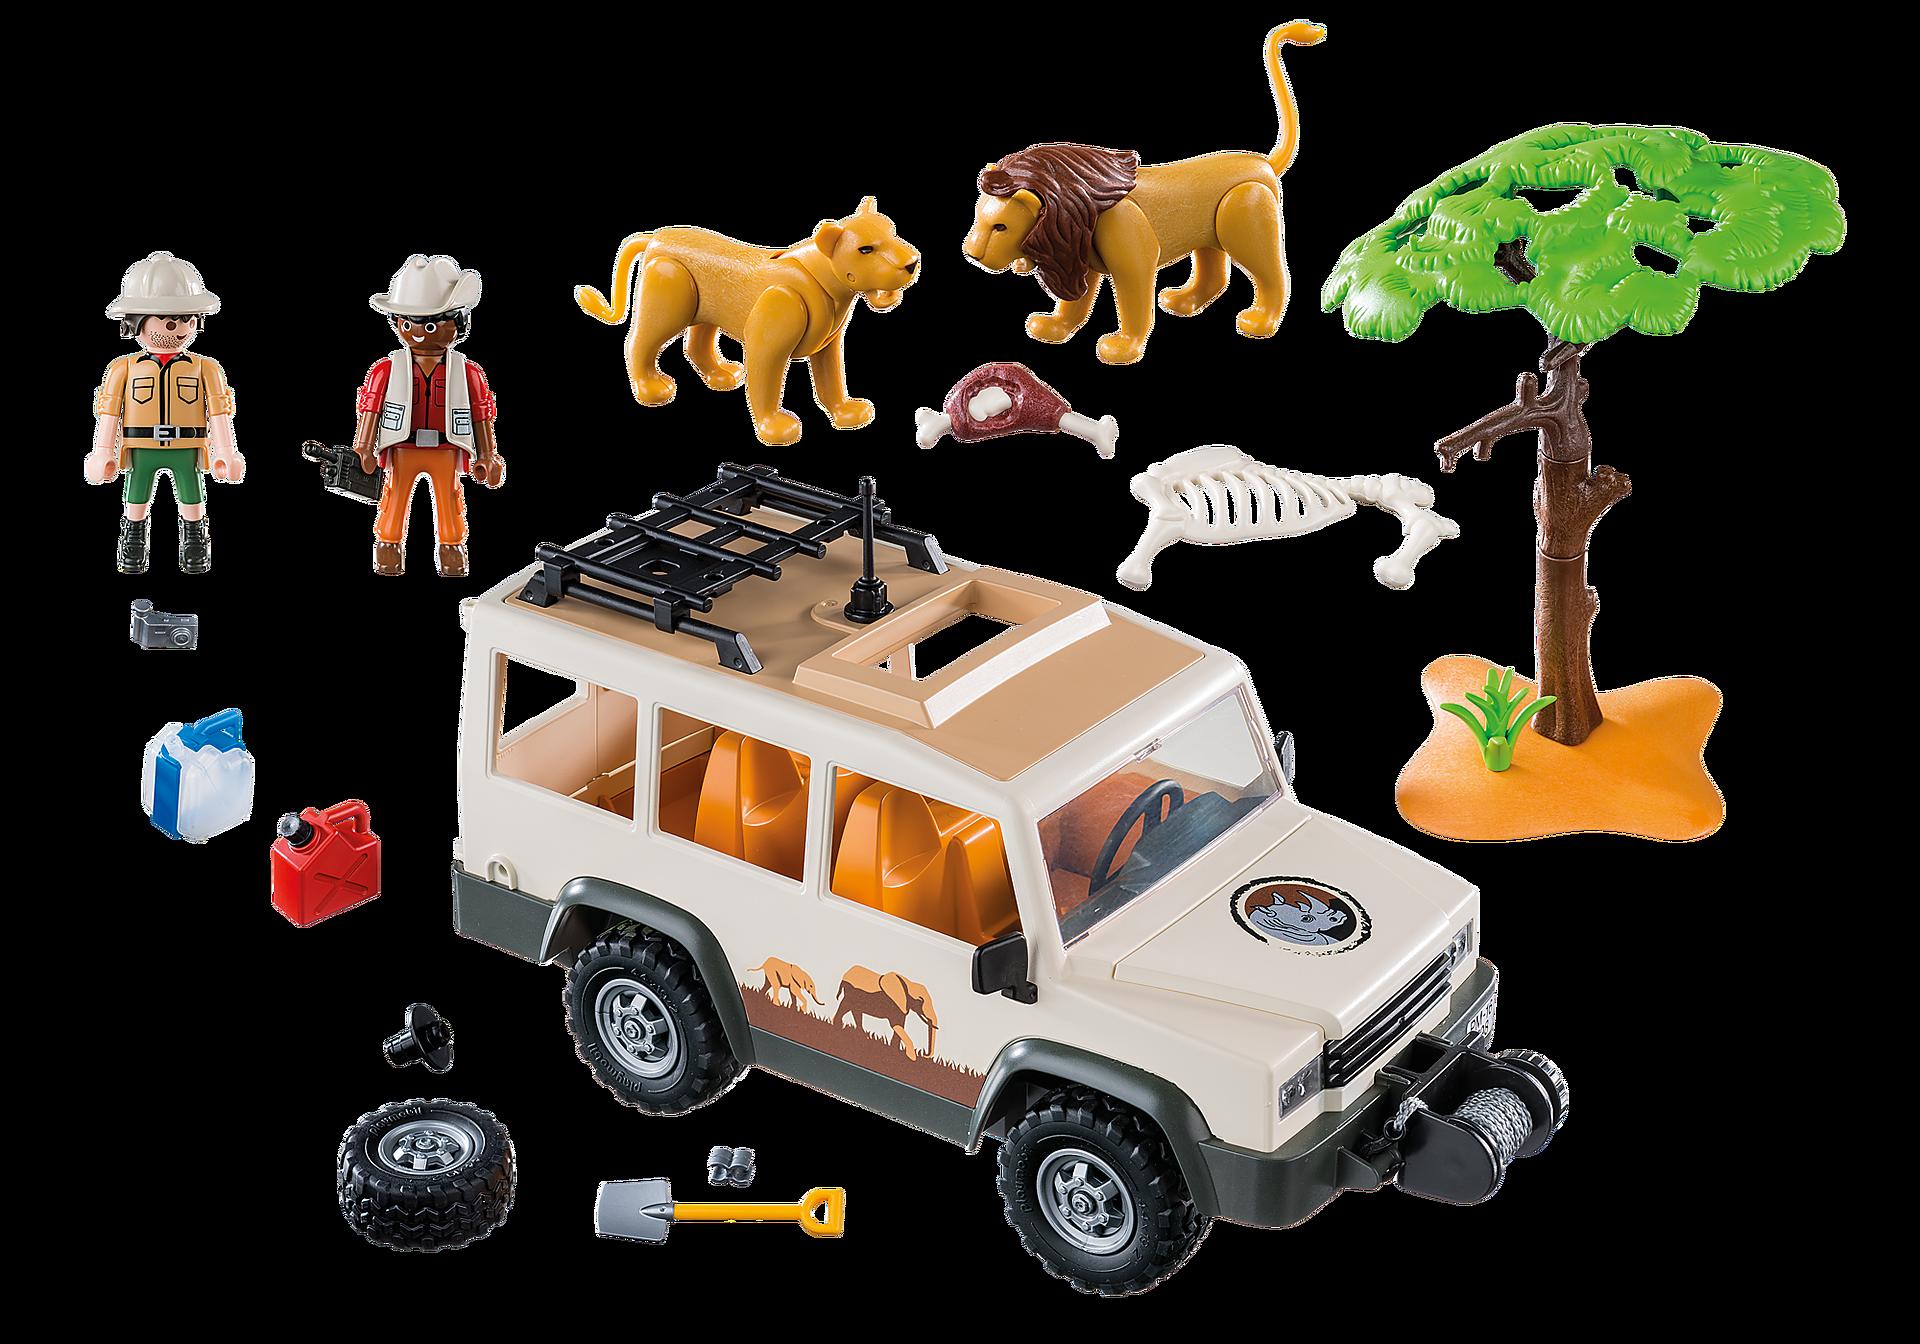 http://media.playmobil.com/i/playmobil/6798_product_box_back/Safari-Geländewagen mit Seilwinde